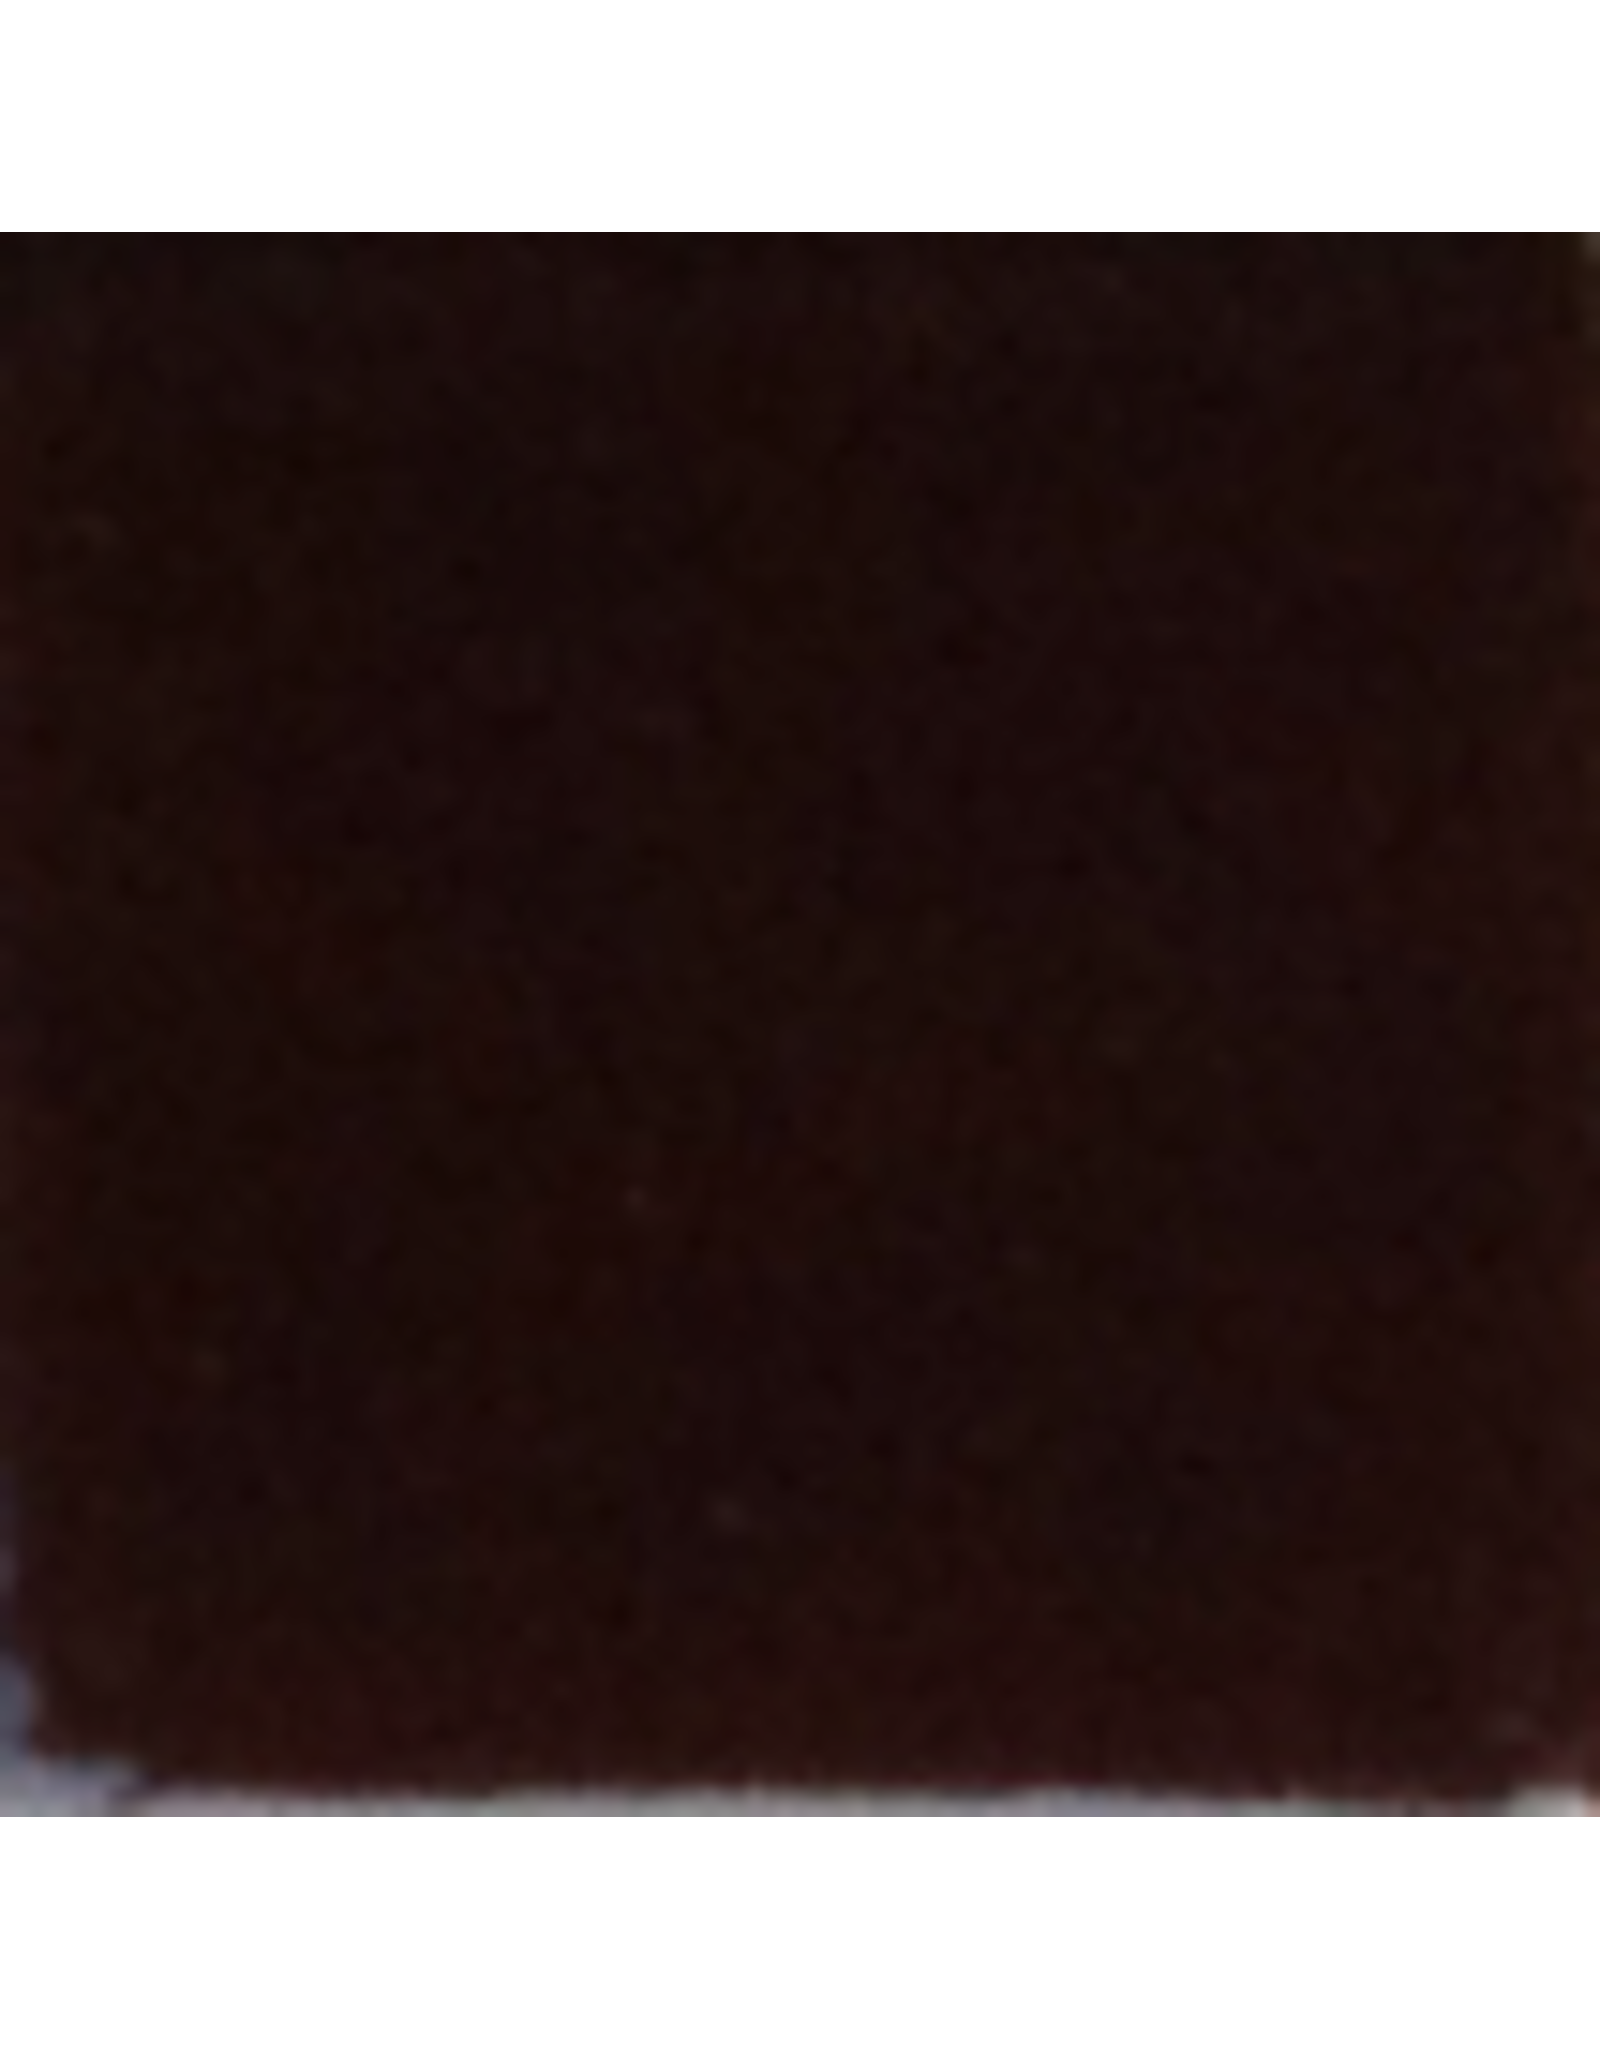 Contem UG39 Chocolate brown Underglaze